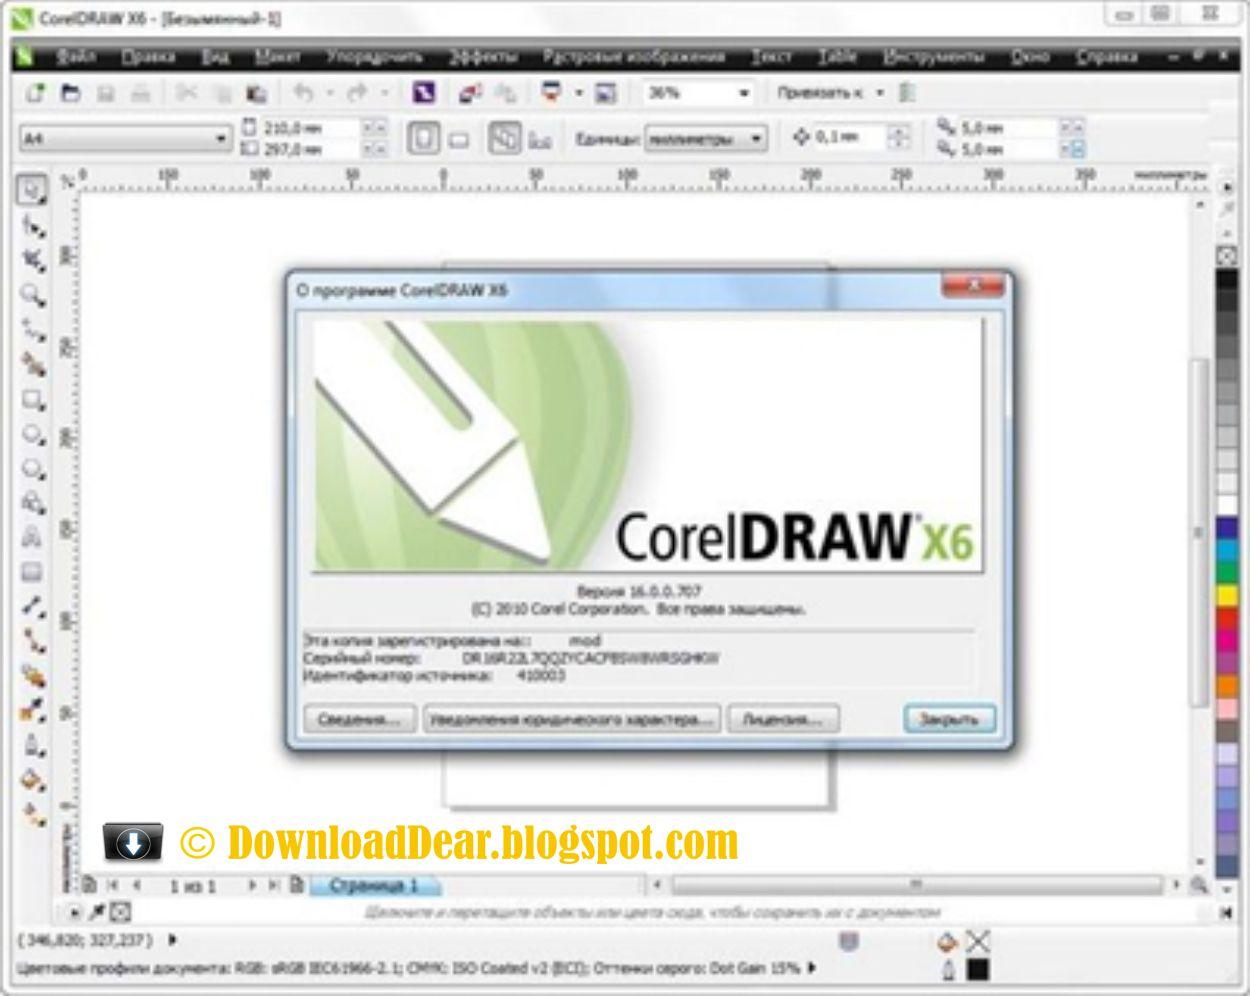 download clipart corel draw x6 - photo #15